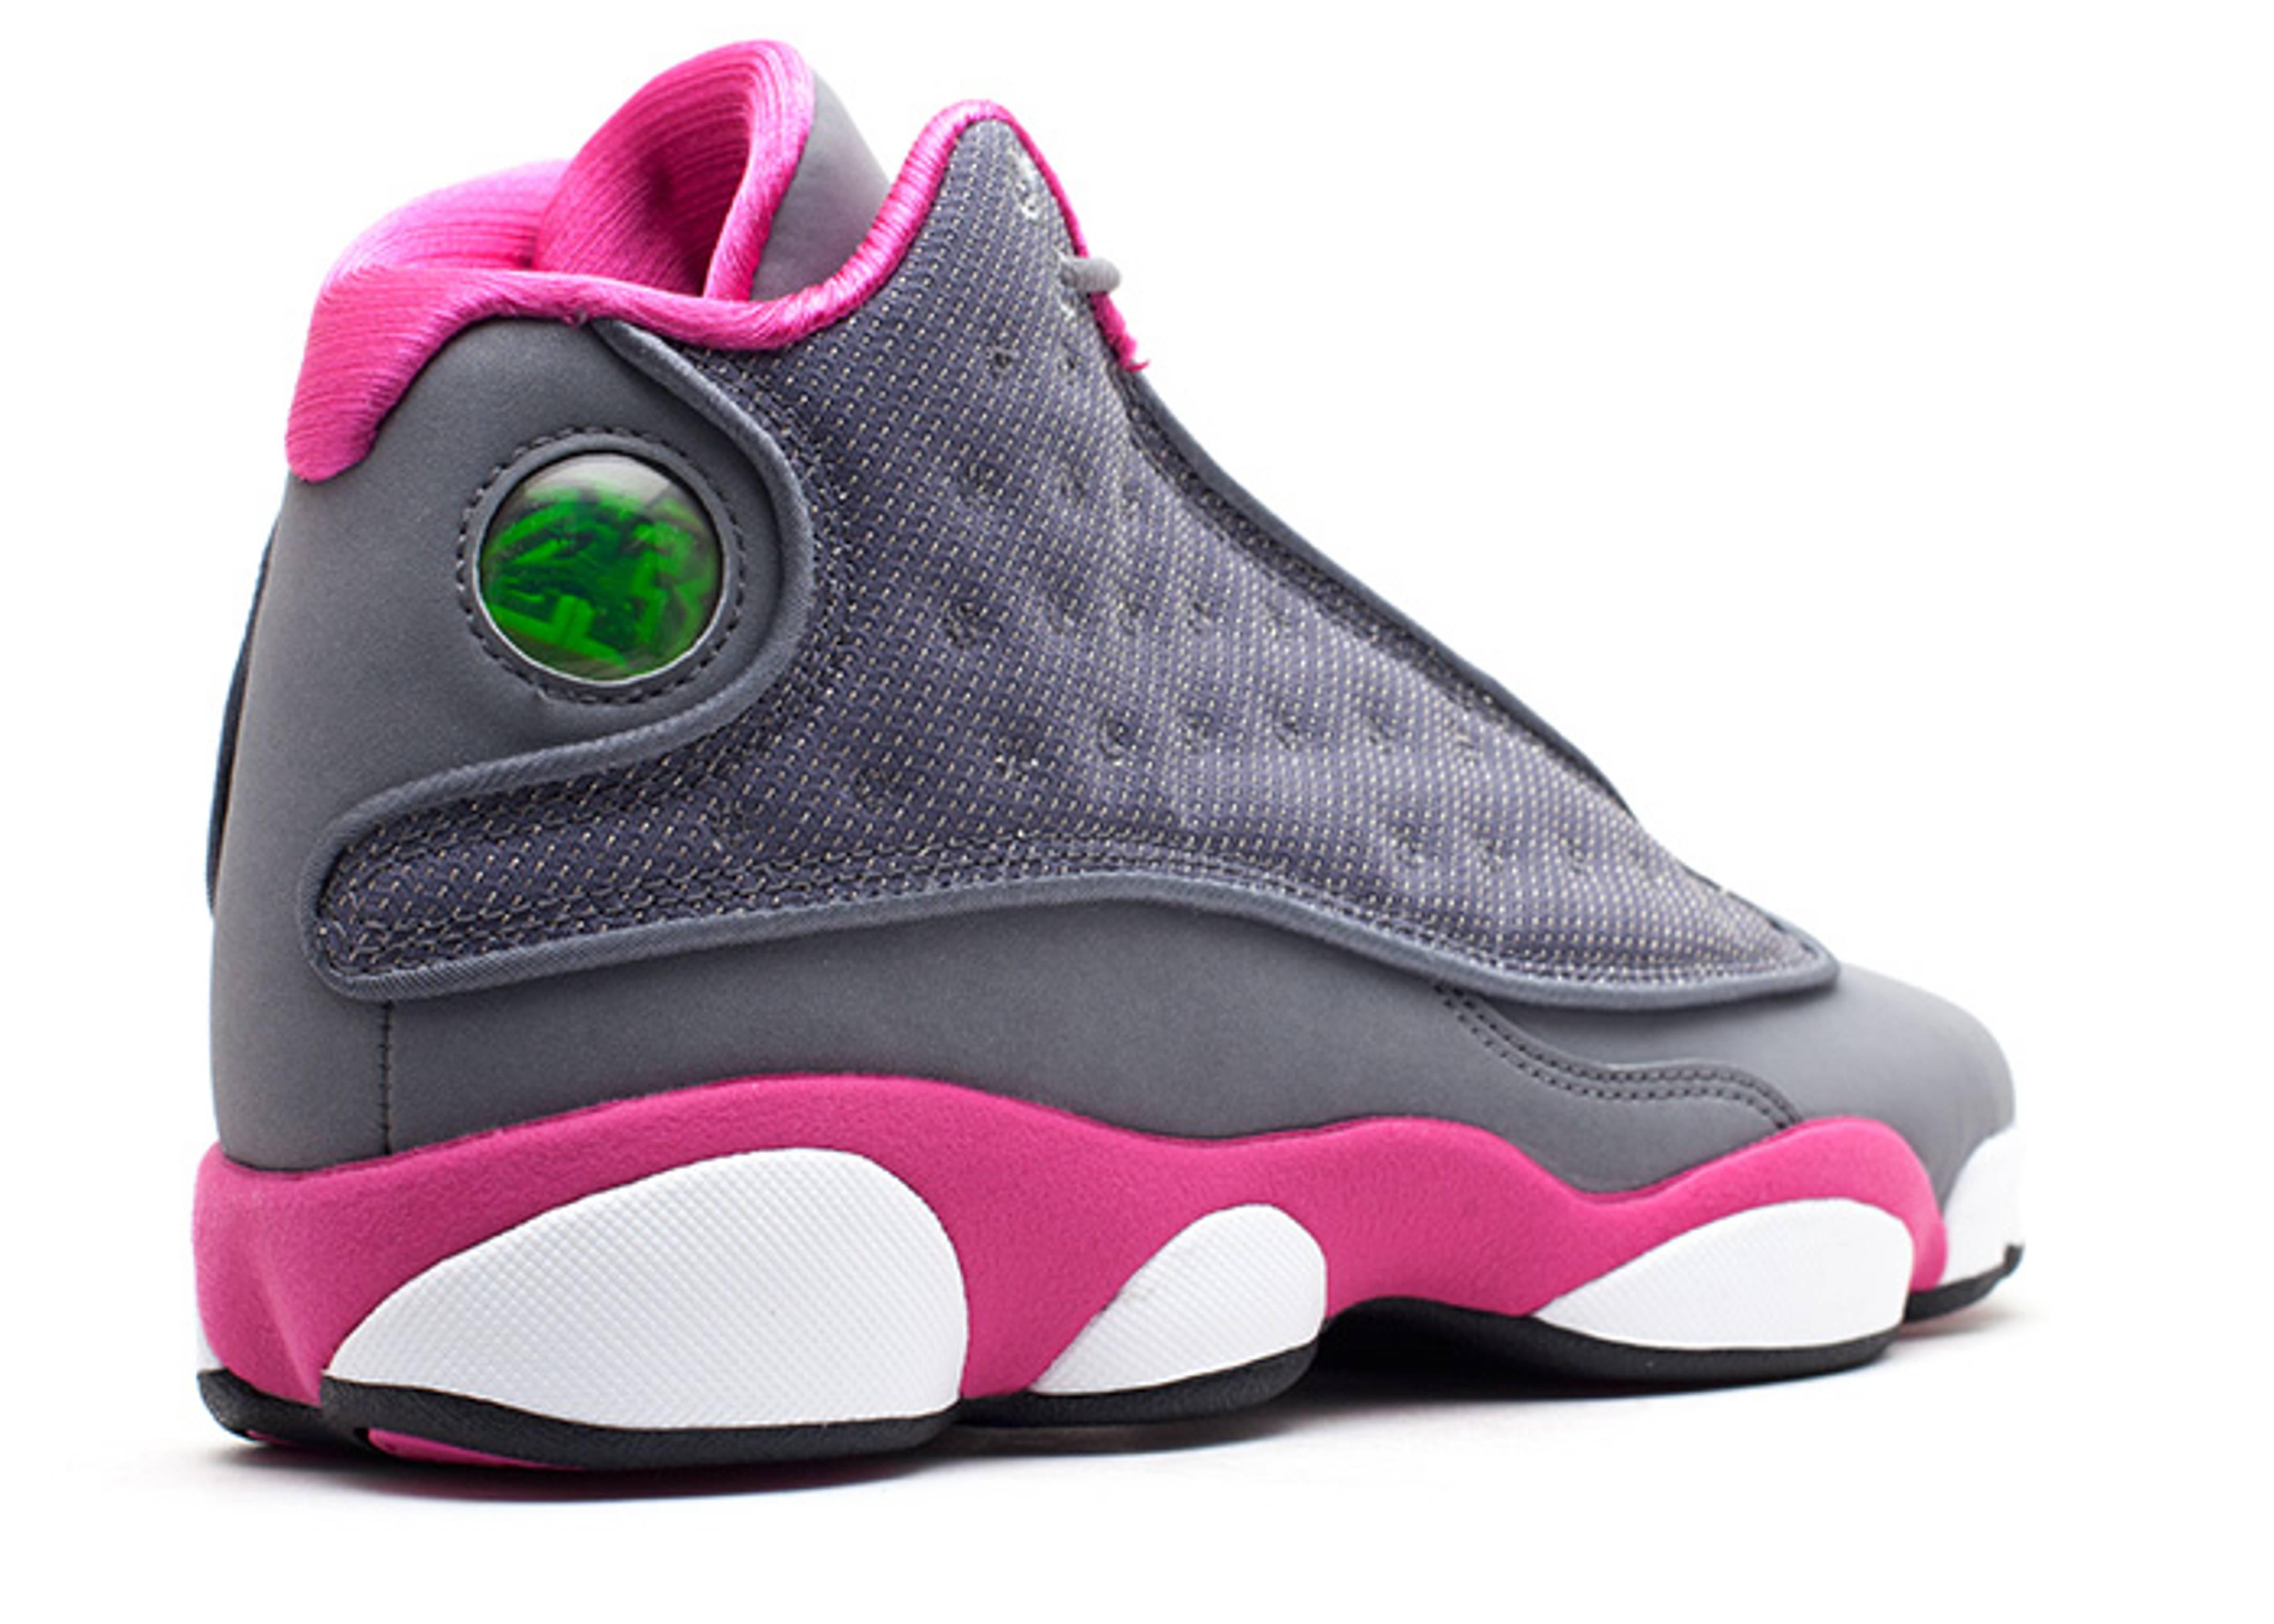 ... clearance girls air jordan 13 gg air jordan 439358 029 cool grey fusion  pink white flight ... a6568f335cda